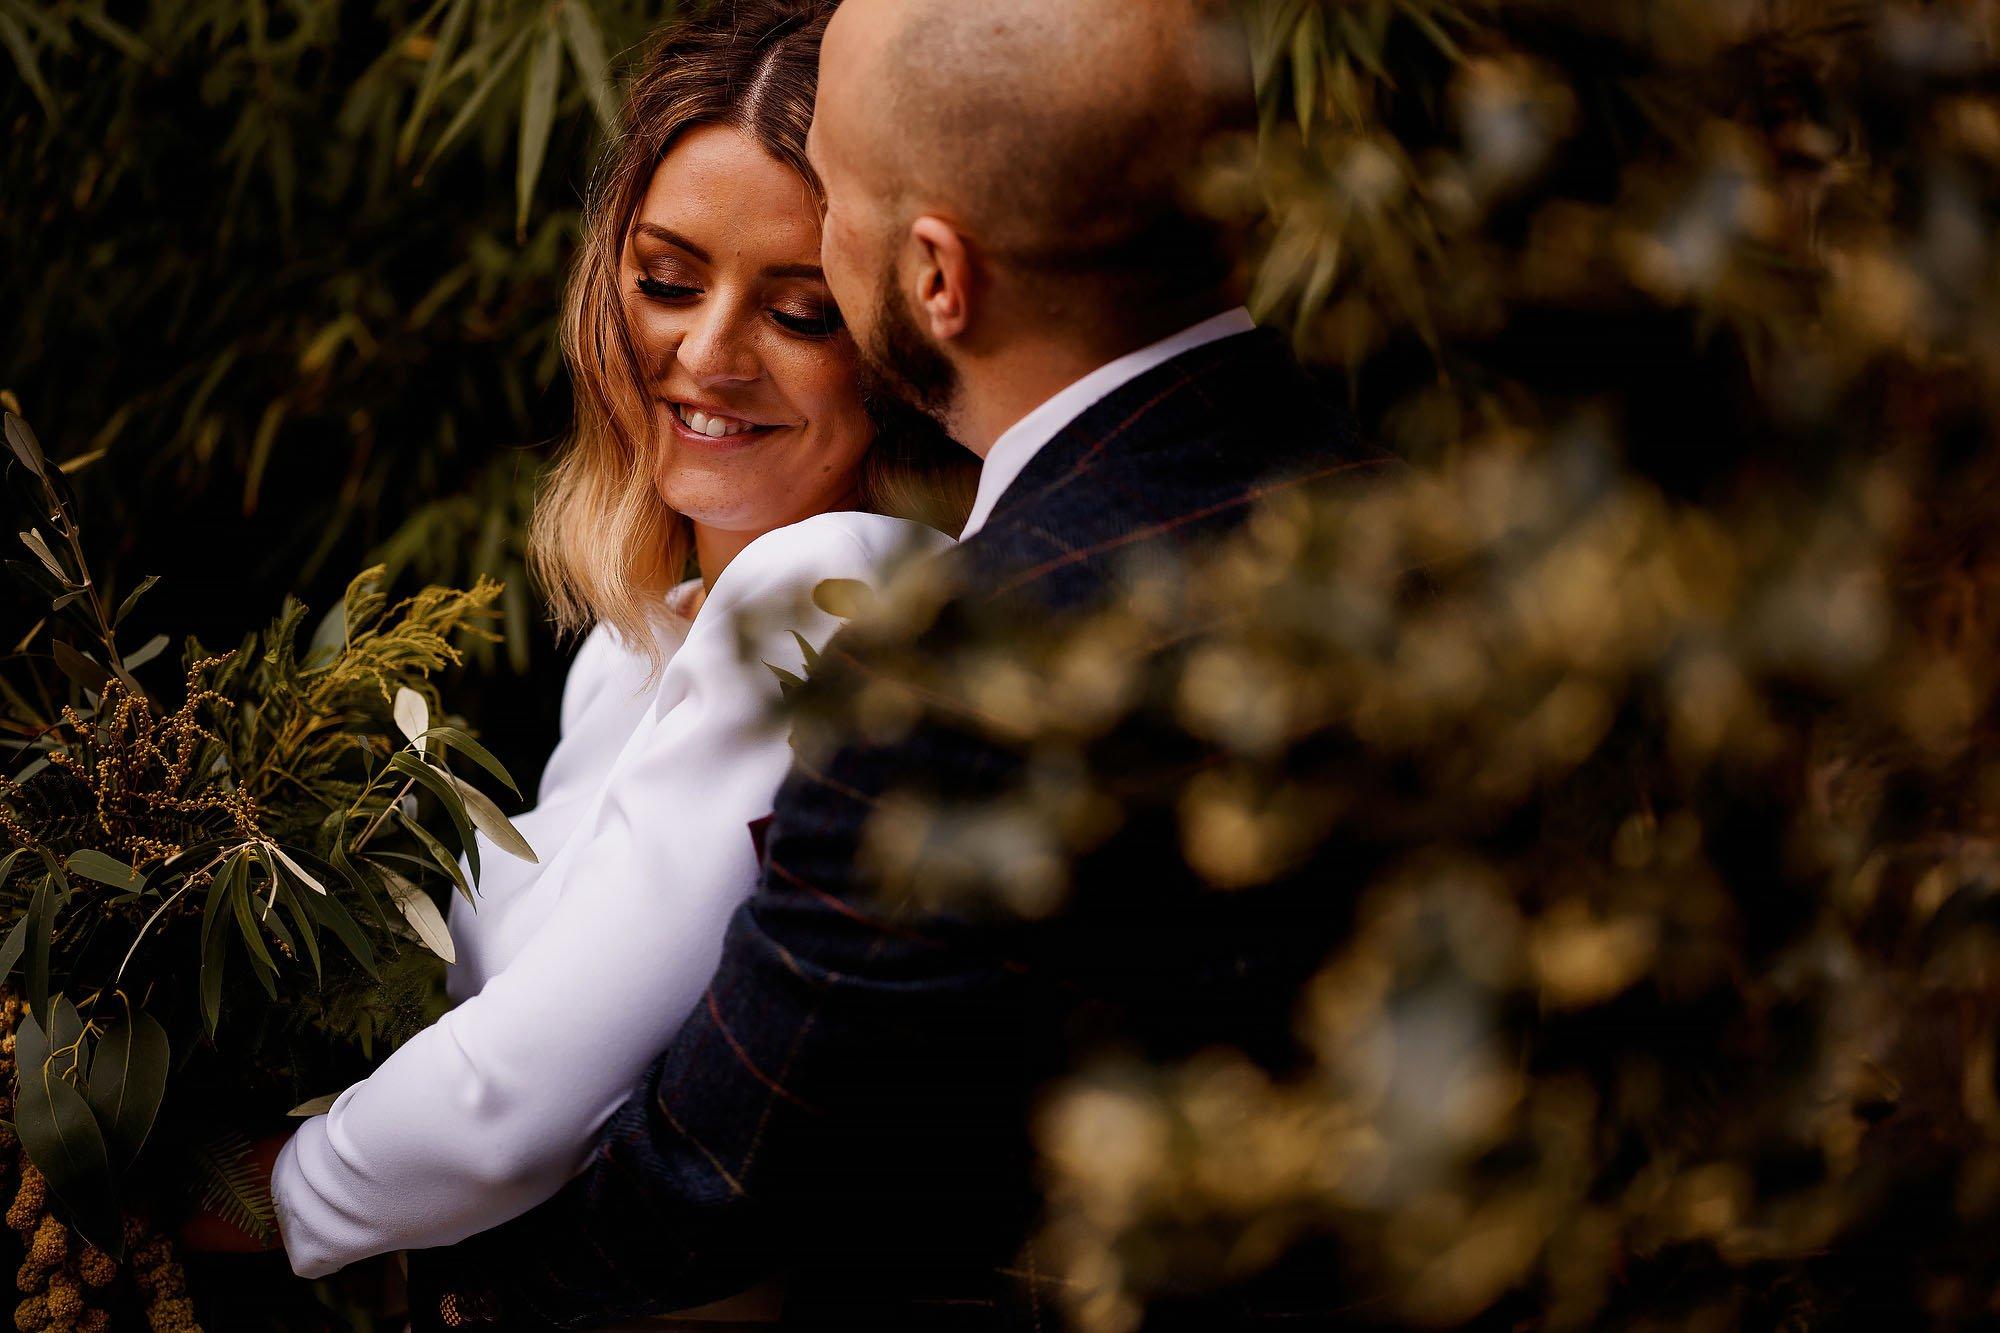 Cheshire wedding photographer - arj photography®